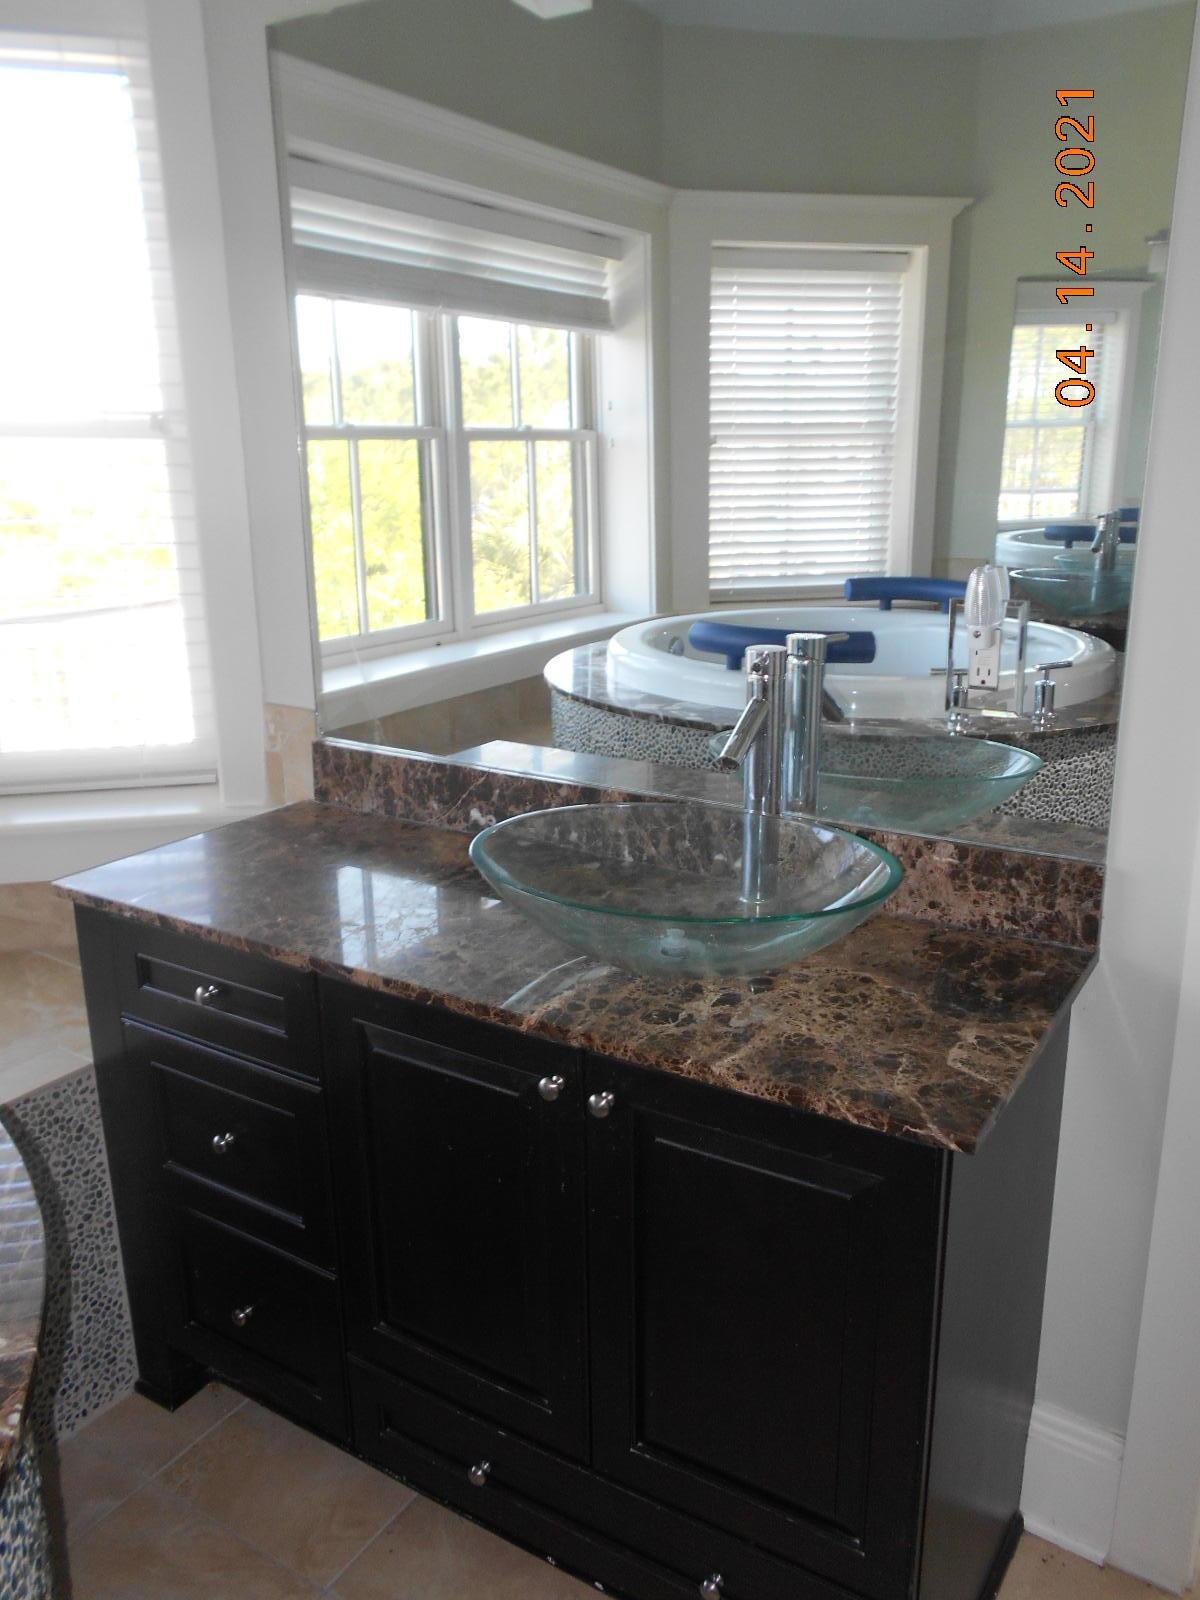 Beresford Creek Landing Homes For Sale - 1212 Winding Creek, Charleston, SC - 27